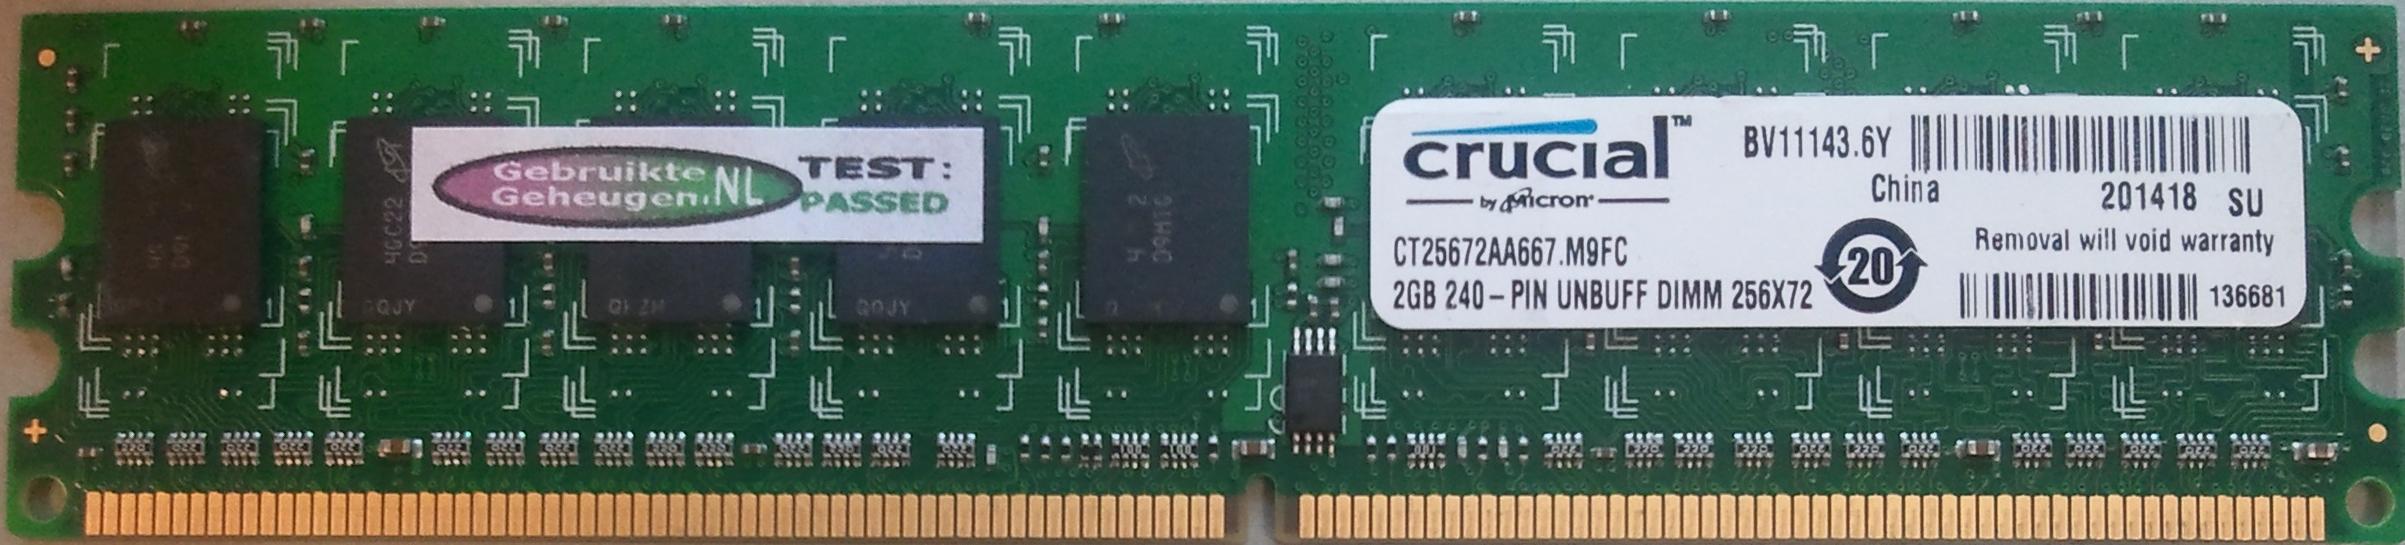 CT25672AA667.M9FC